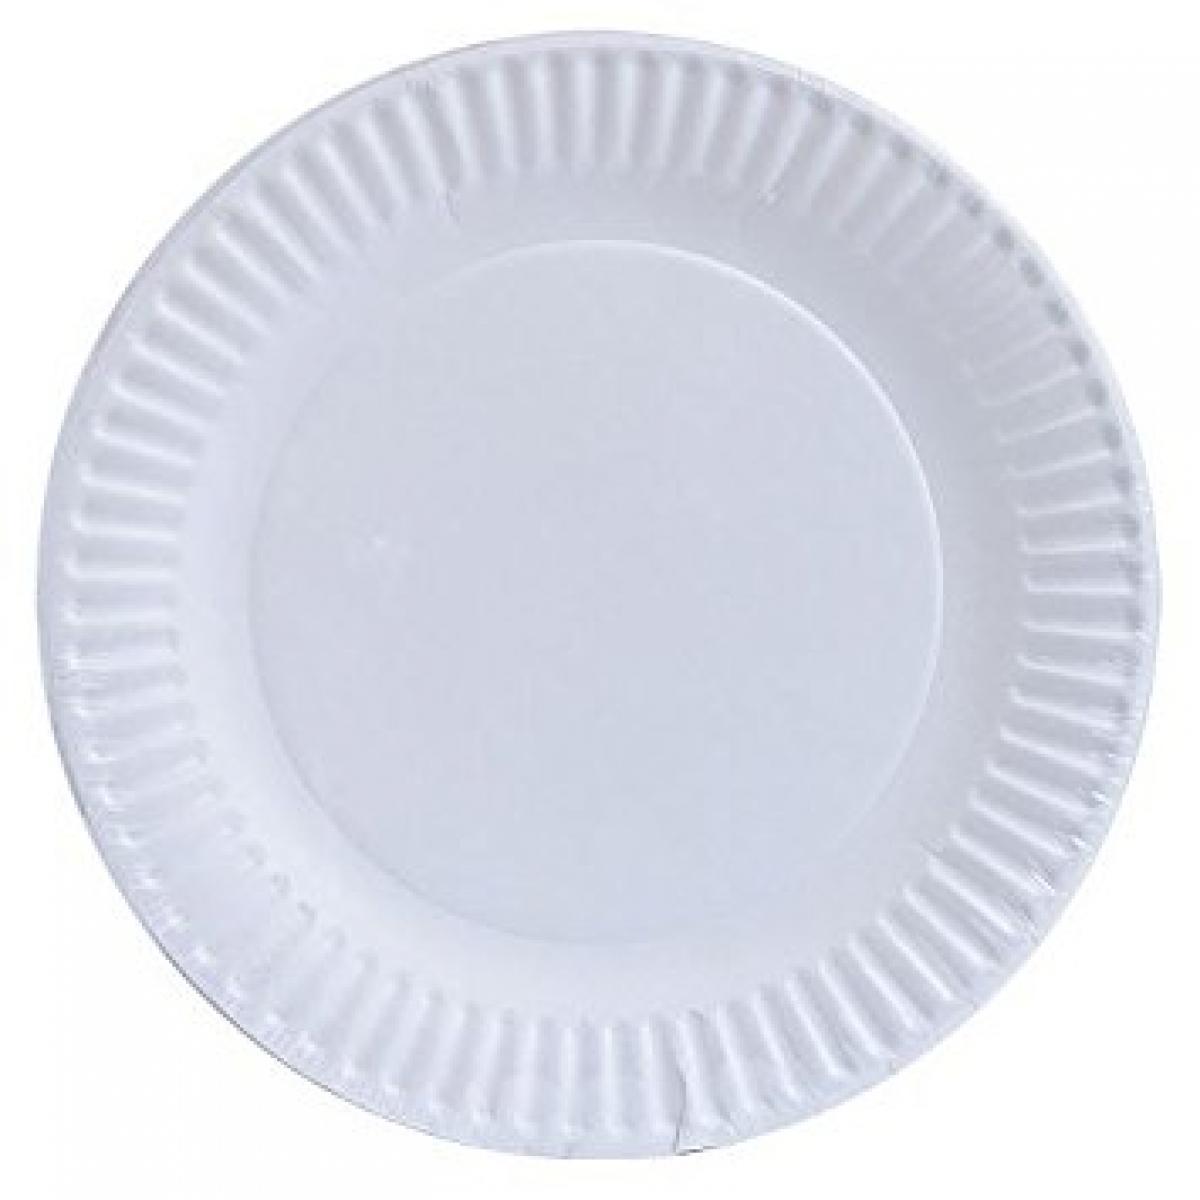 Heavy duty paper plate  sc 1 st  Venecia LCA & Heavy duty paper plate - Venecia Packaging